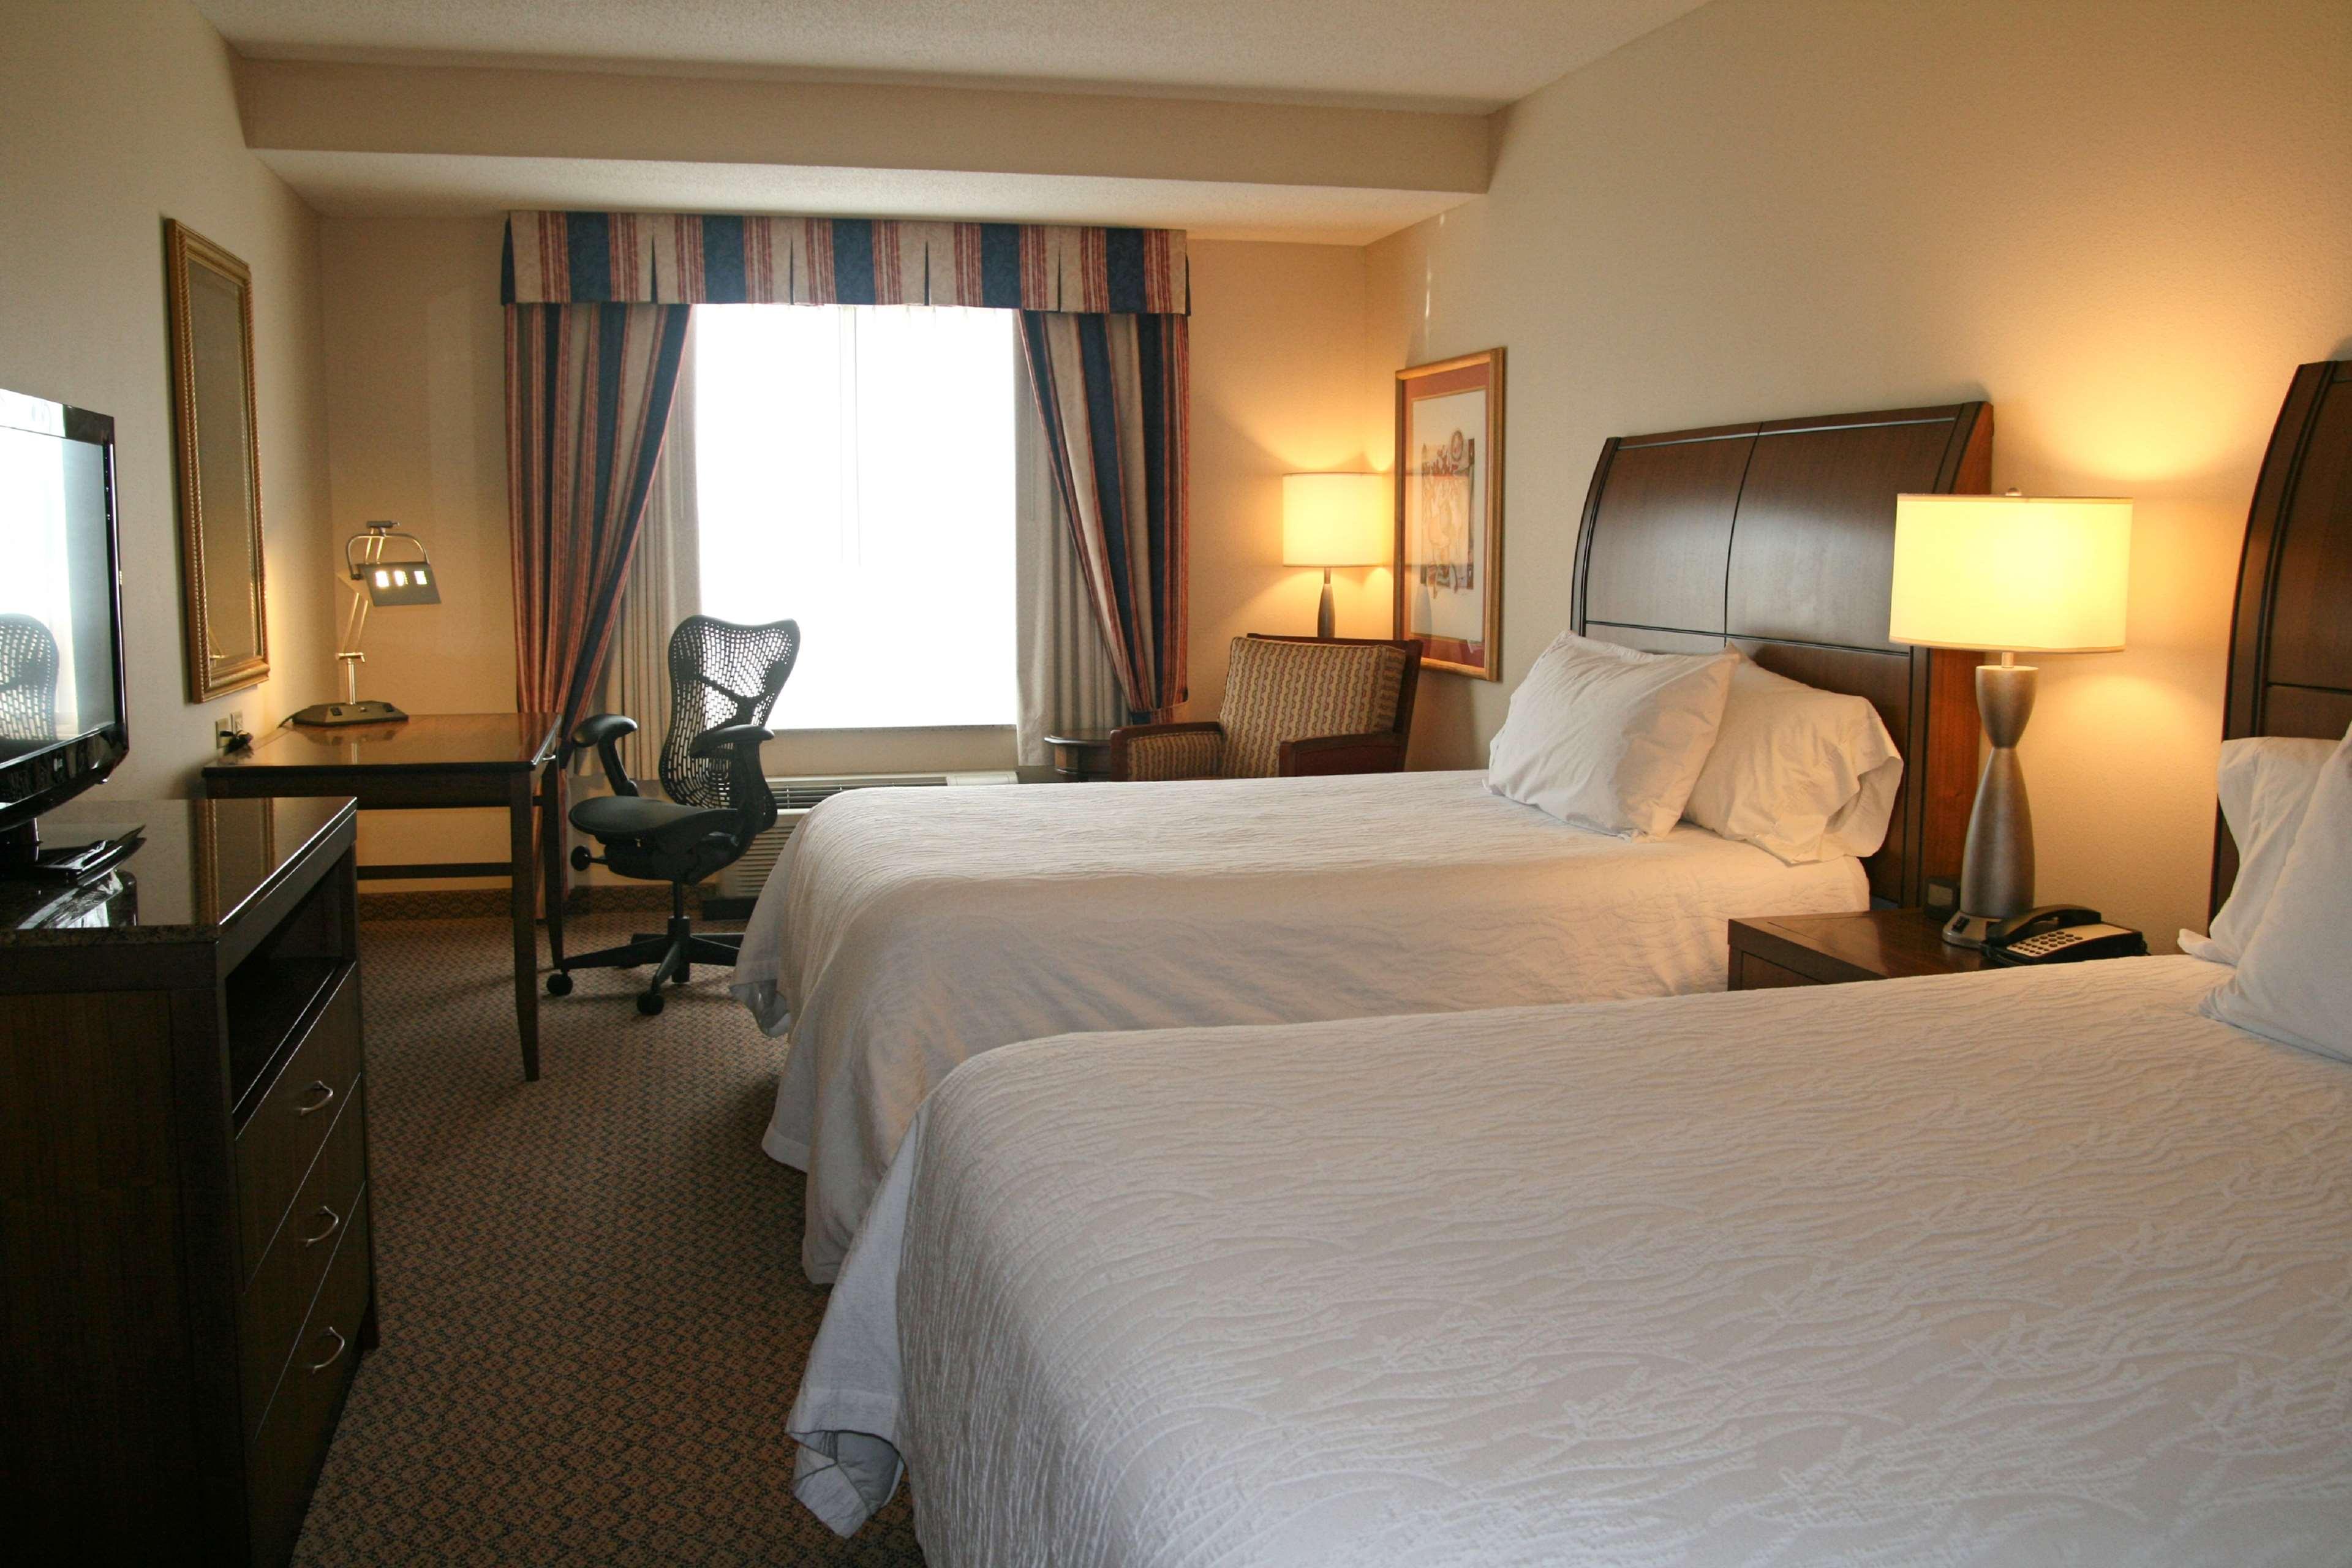 Hilton Garden Inn Elmira/Corning image 24